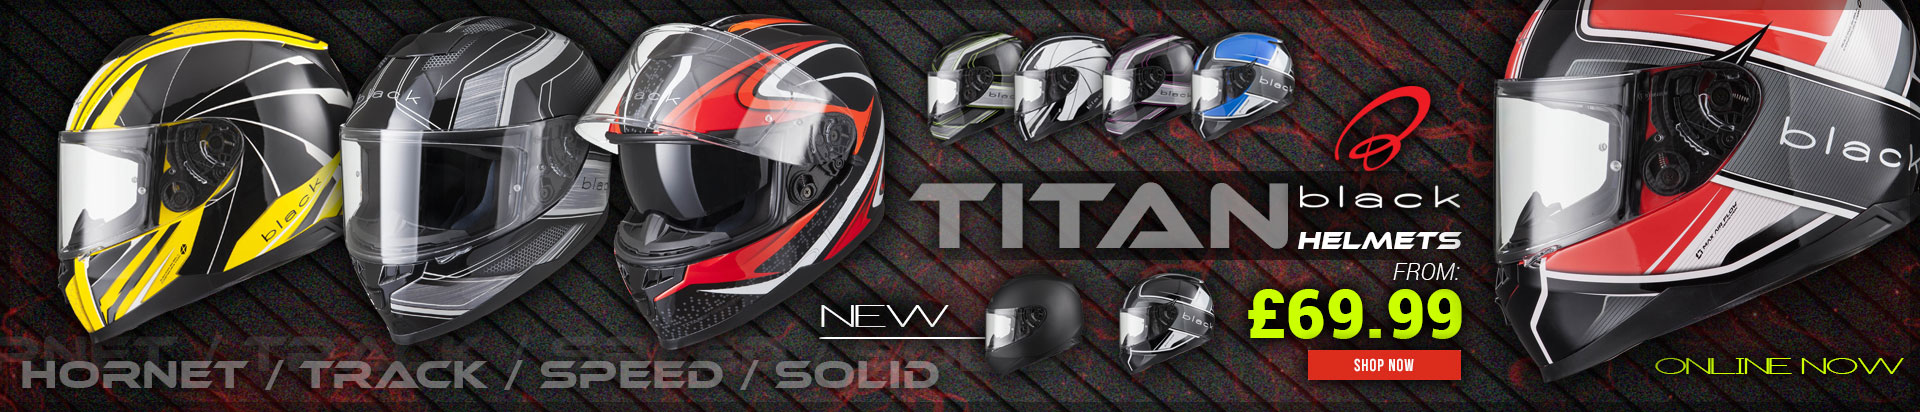 Black Titan Helmets